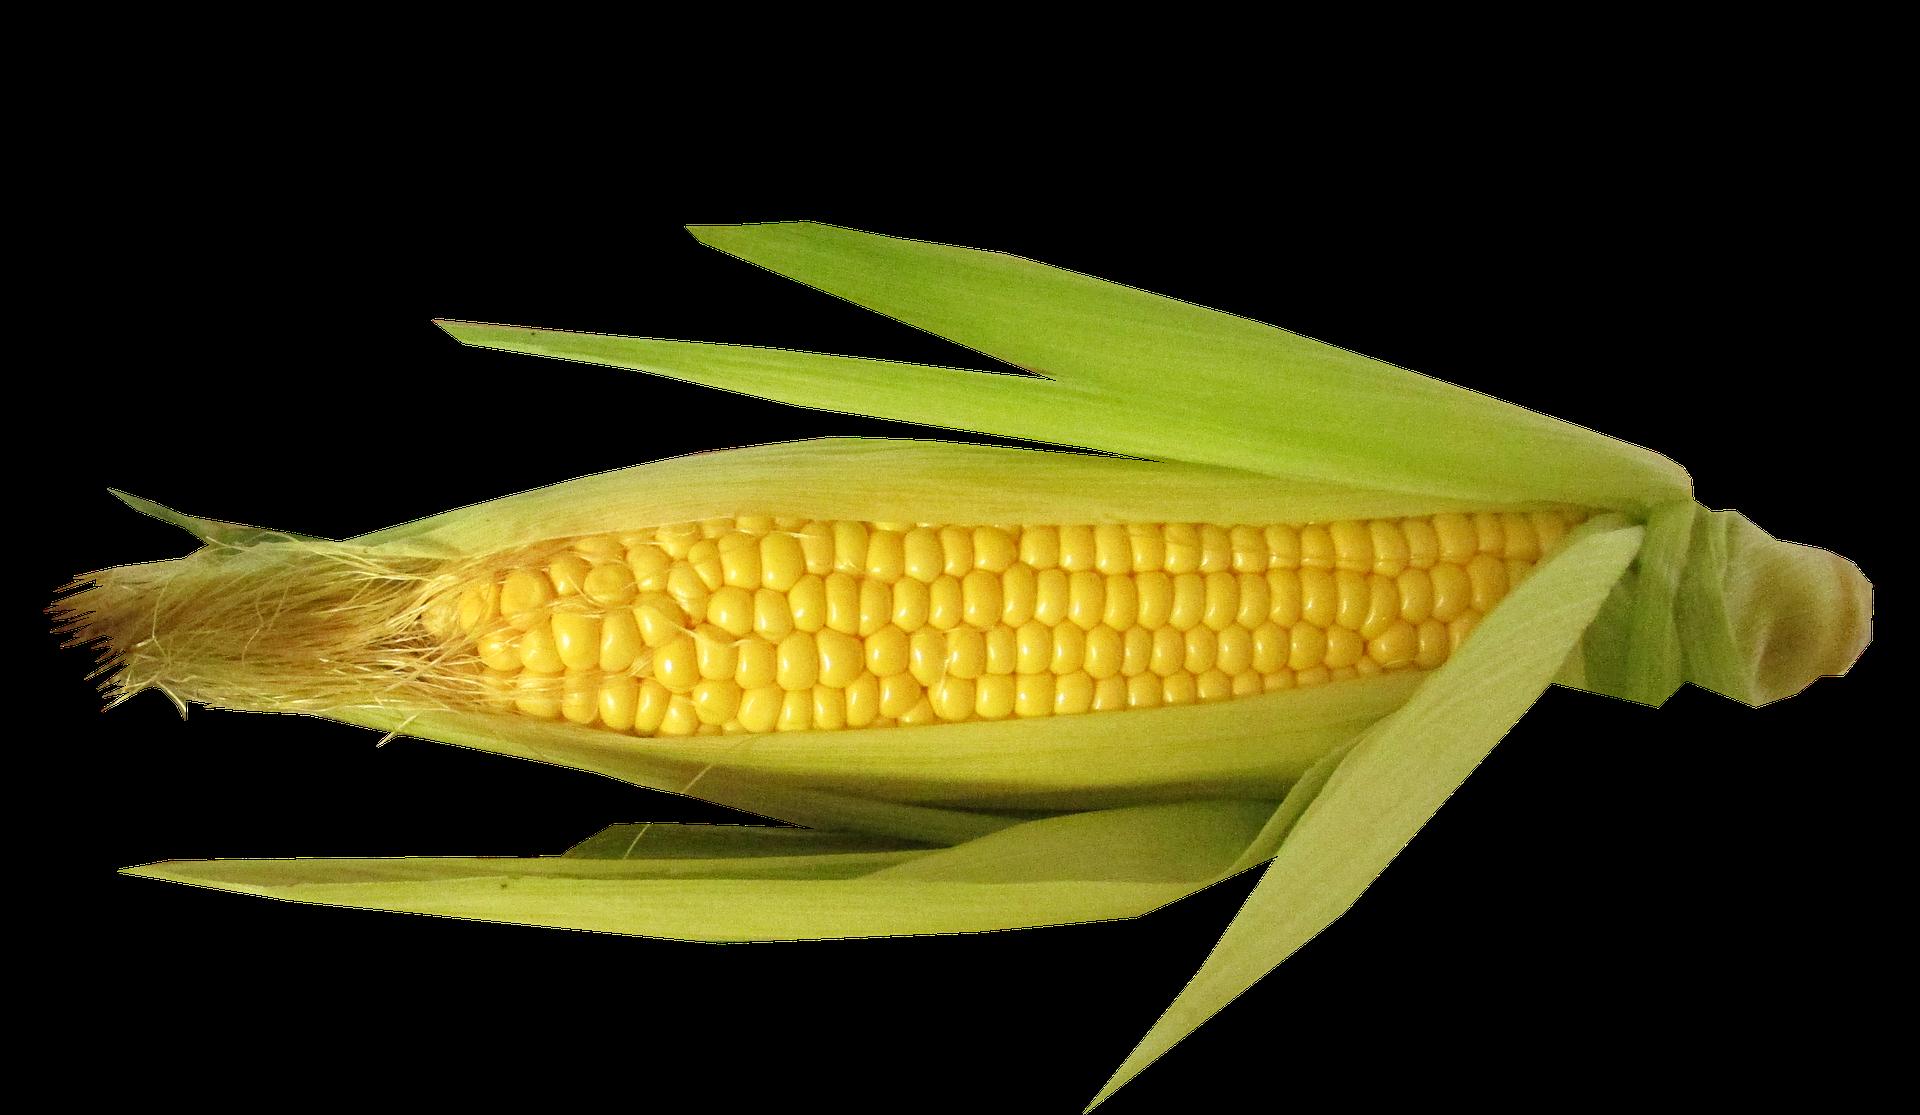 vegetable-2489368_1920